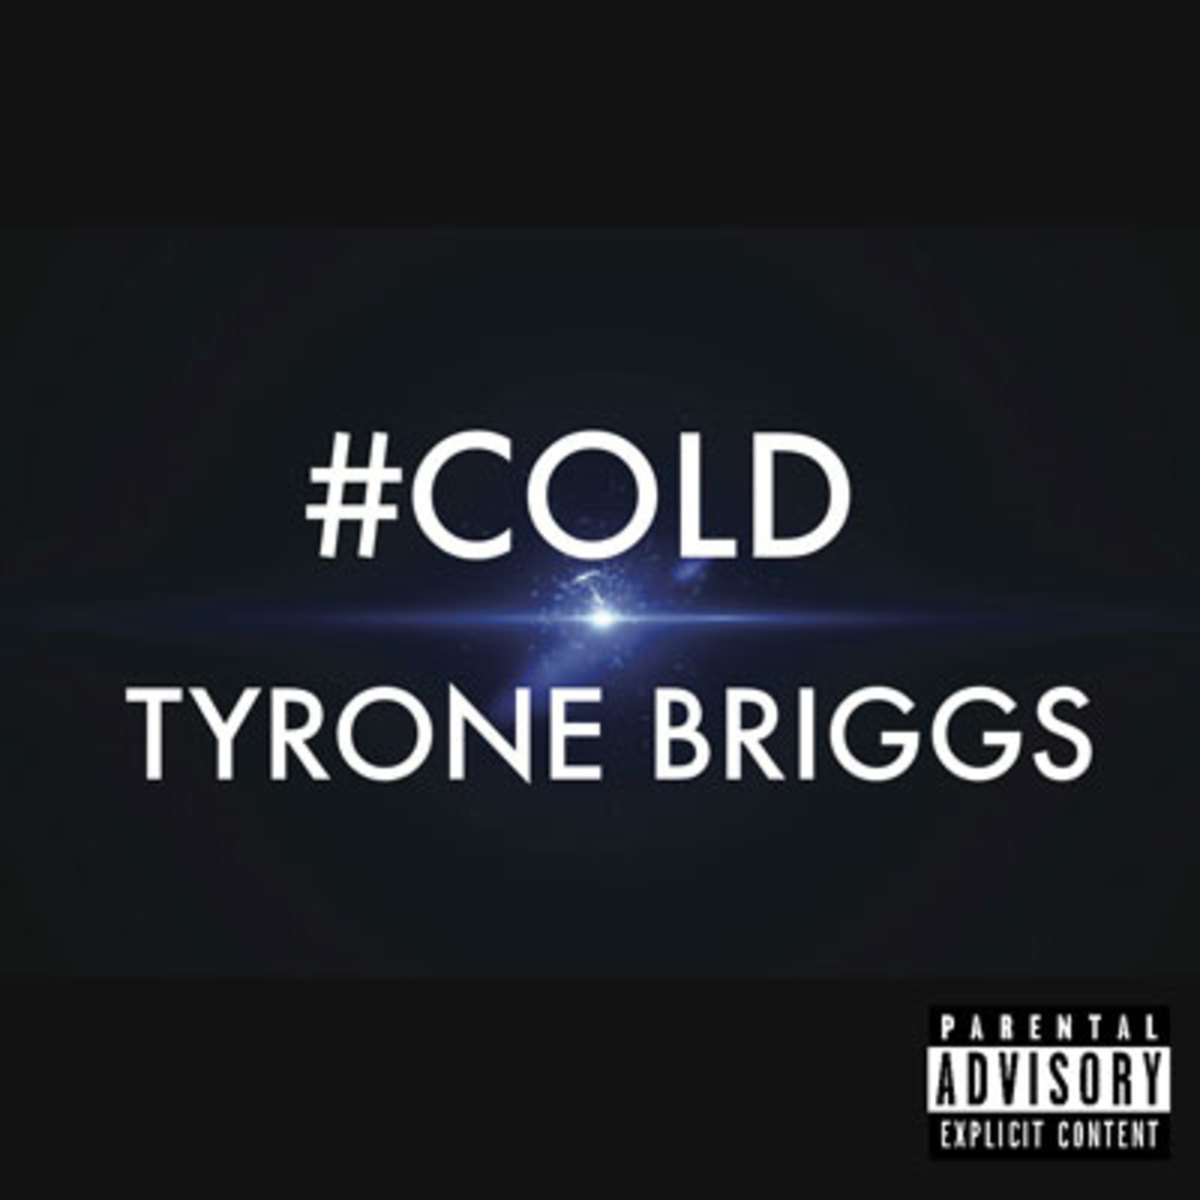 tyronebriggs-cold.jpg